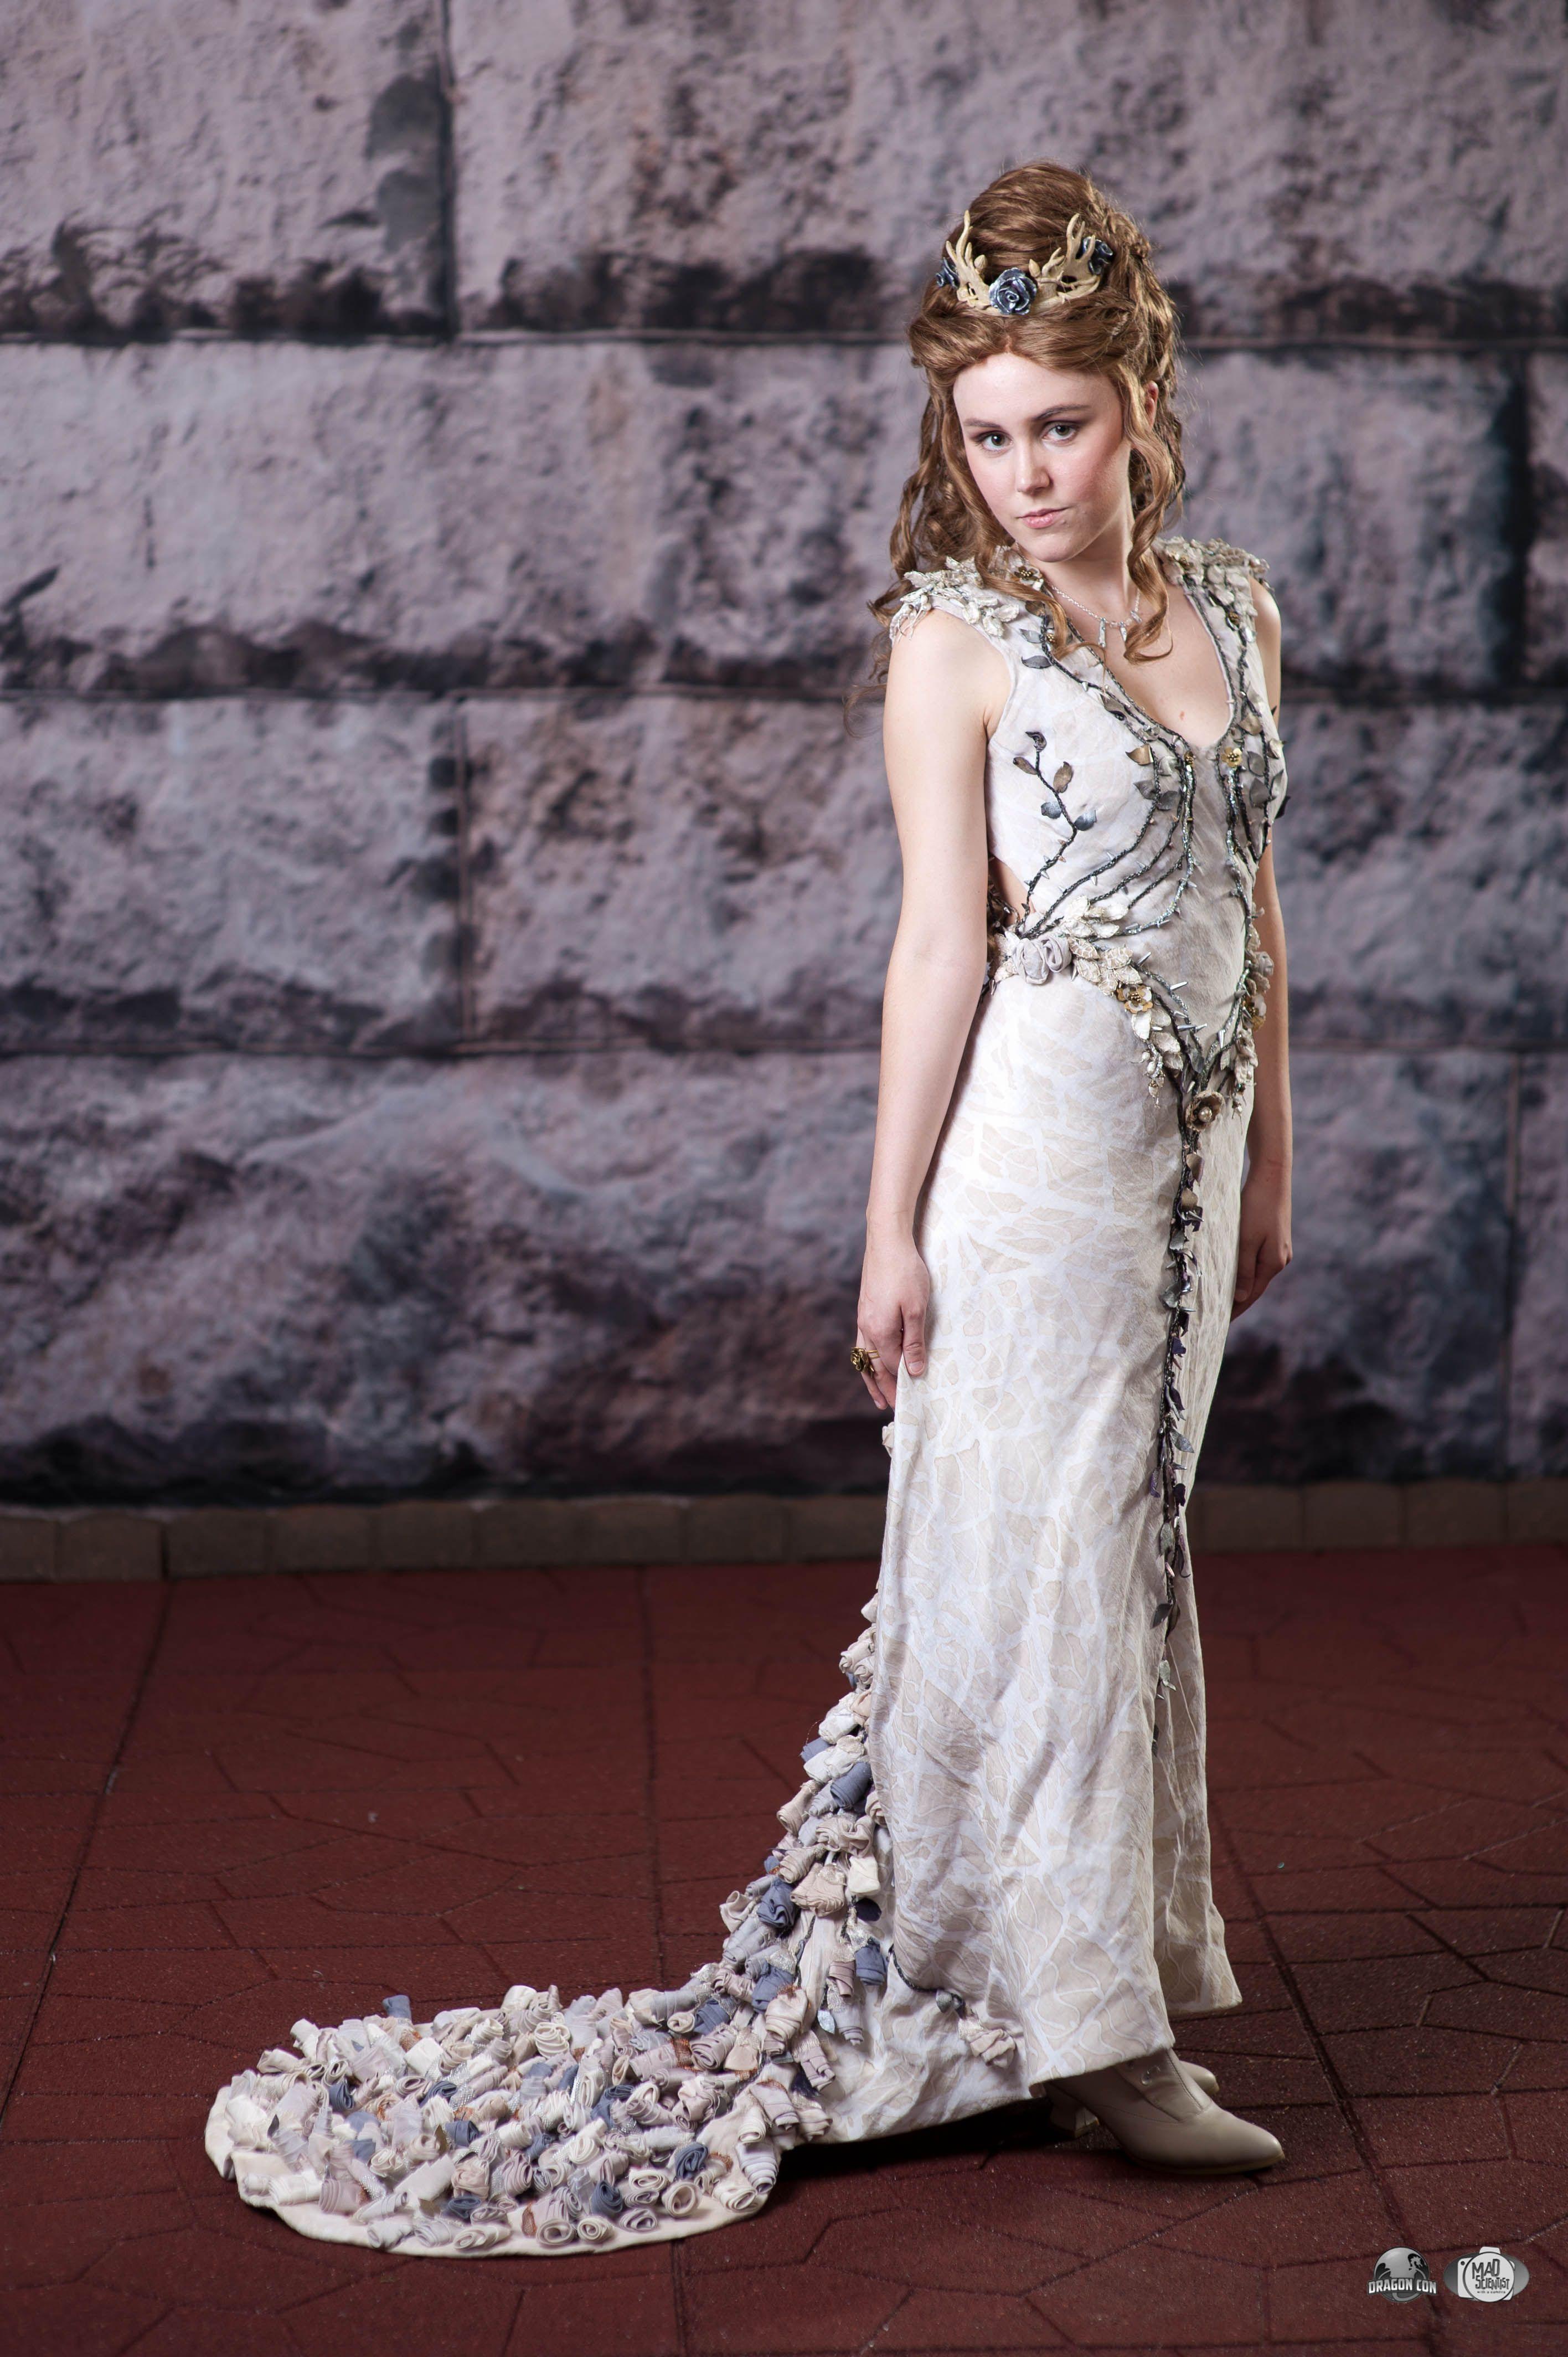 Margaery tyrell purple wedding dress game of thrones for Wedding dresses games online